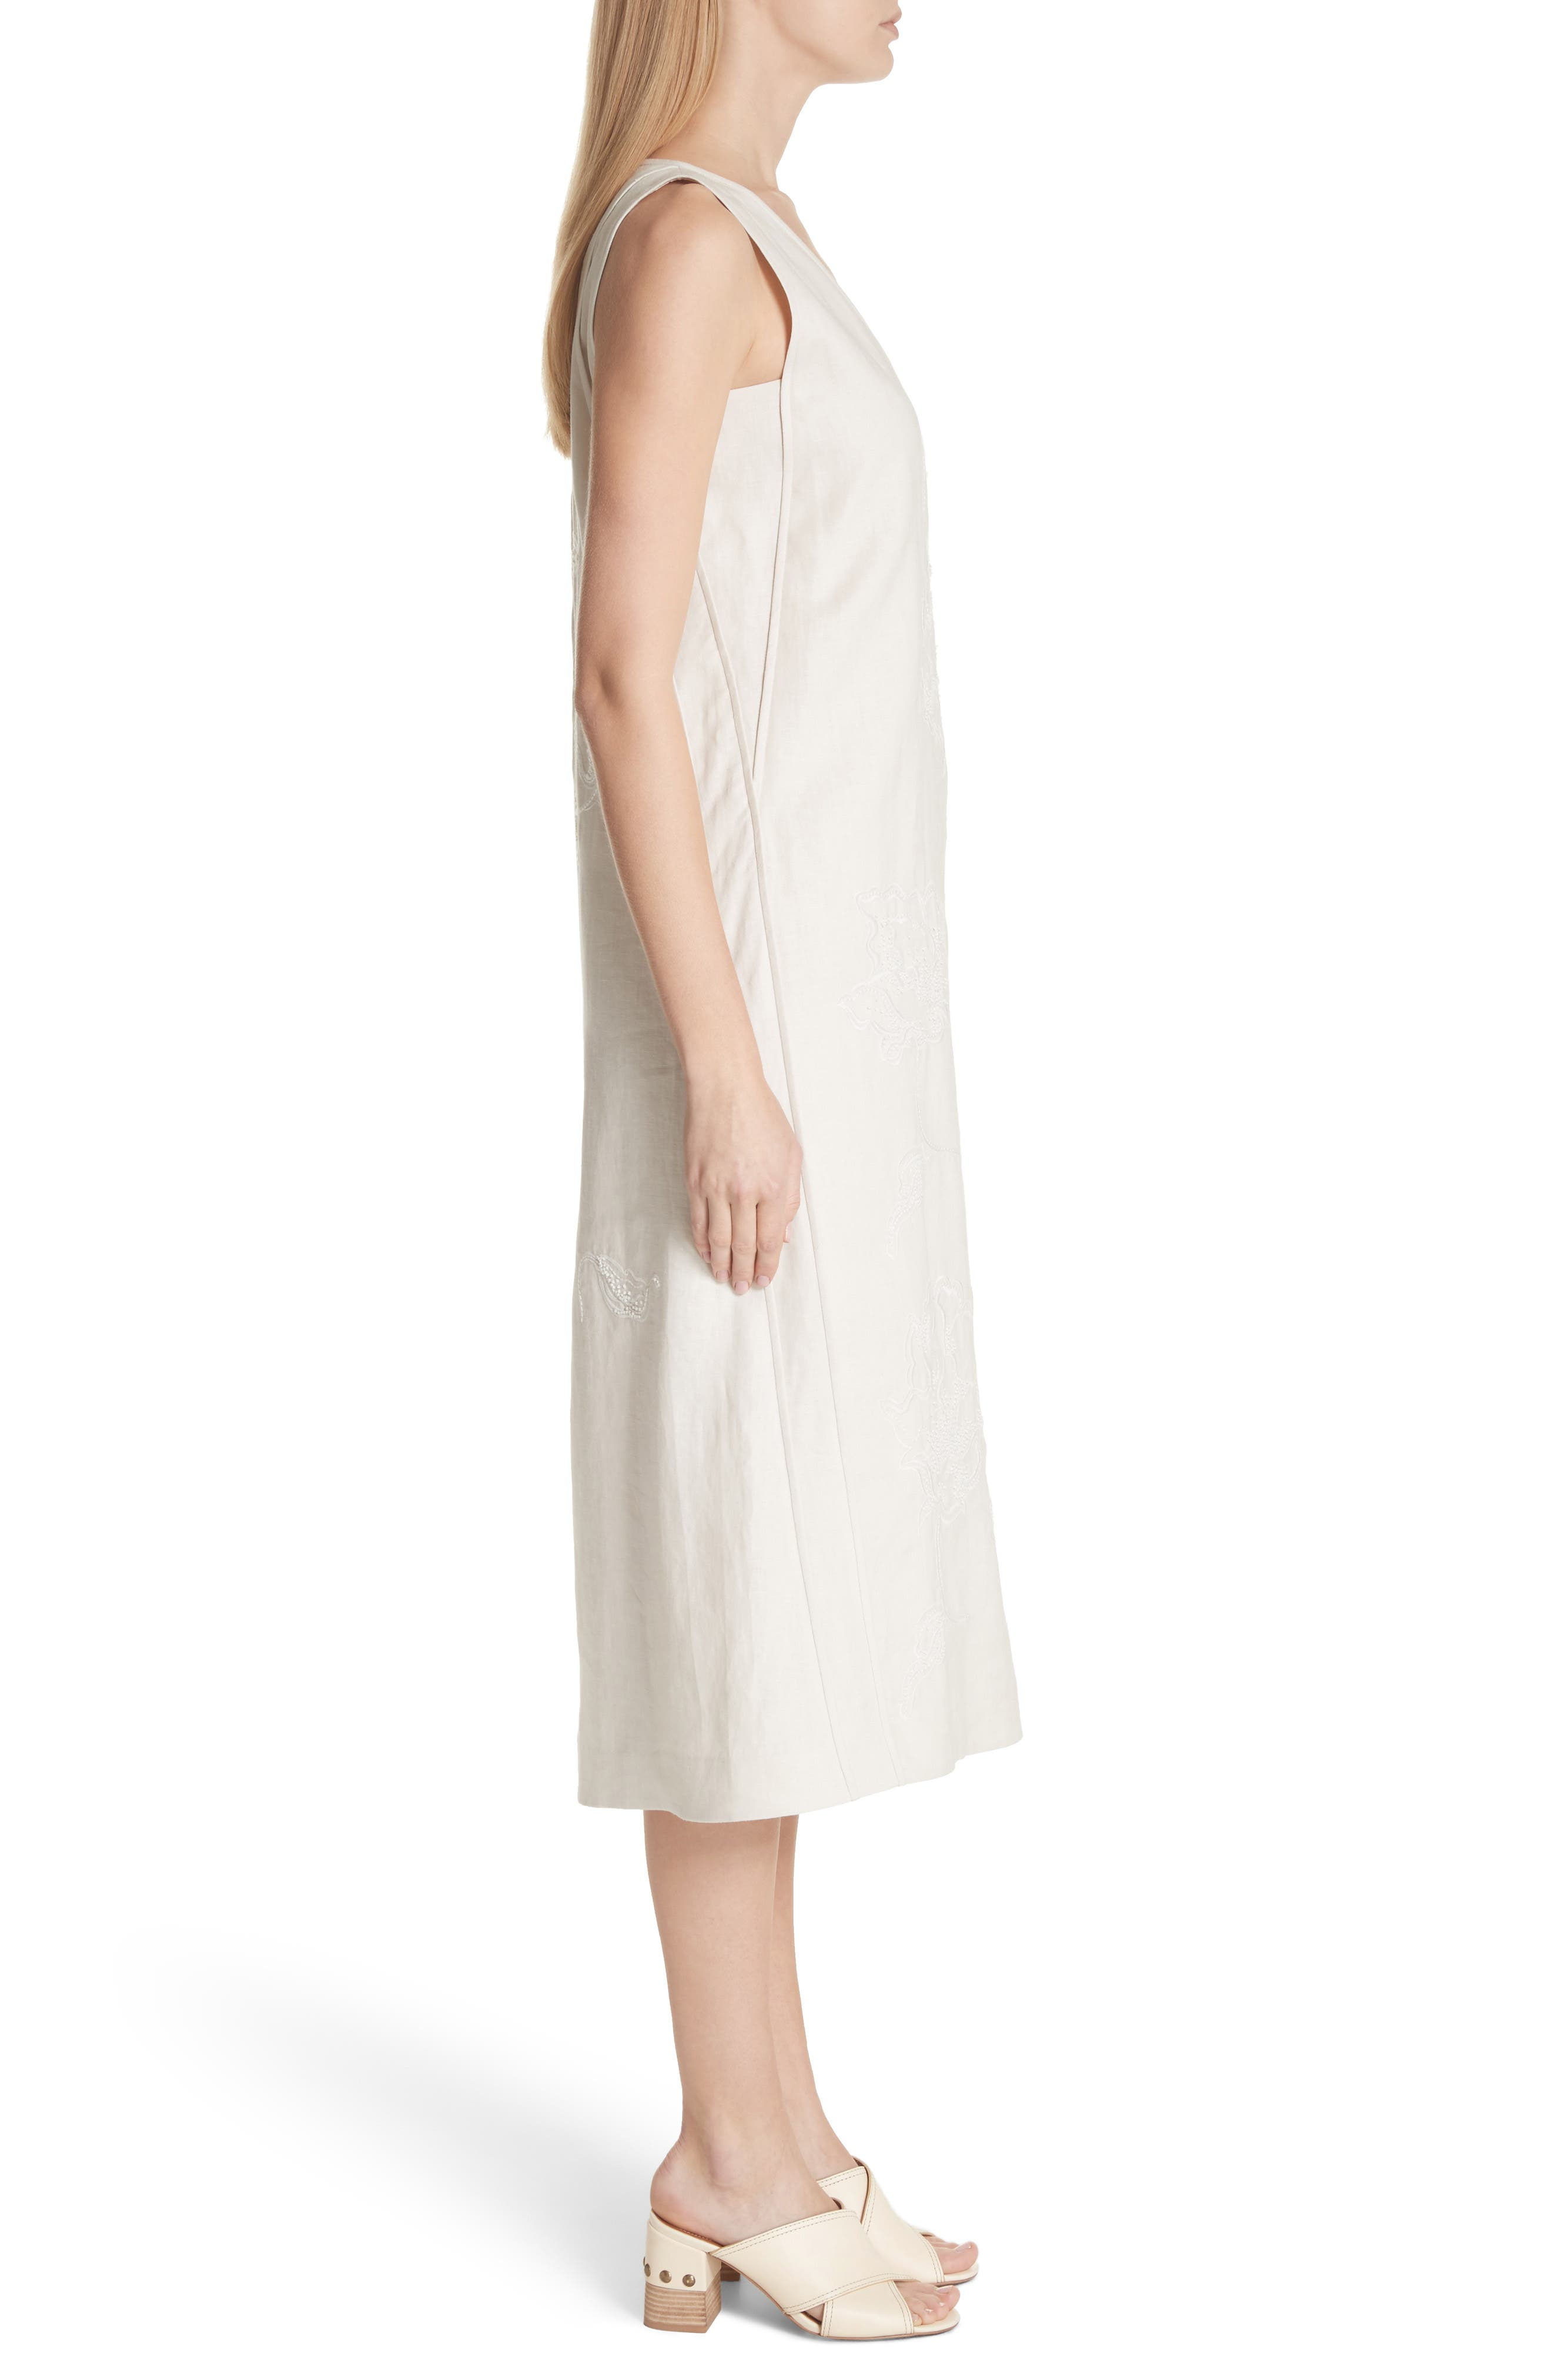 Duncan Embroidered Linen Dress,                             Alternate thumbnail 3, color,                             Raffia